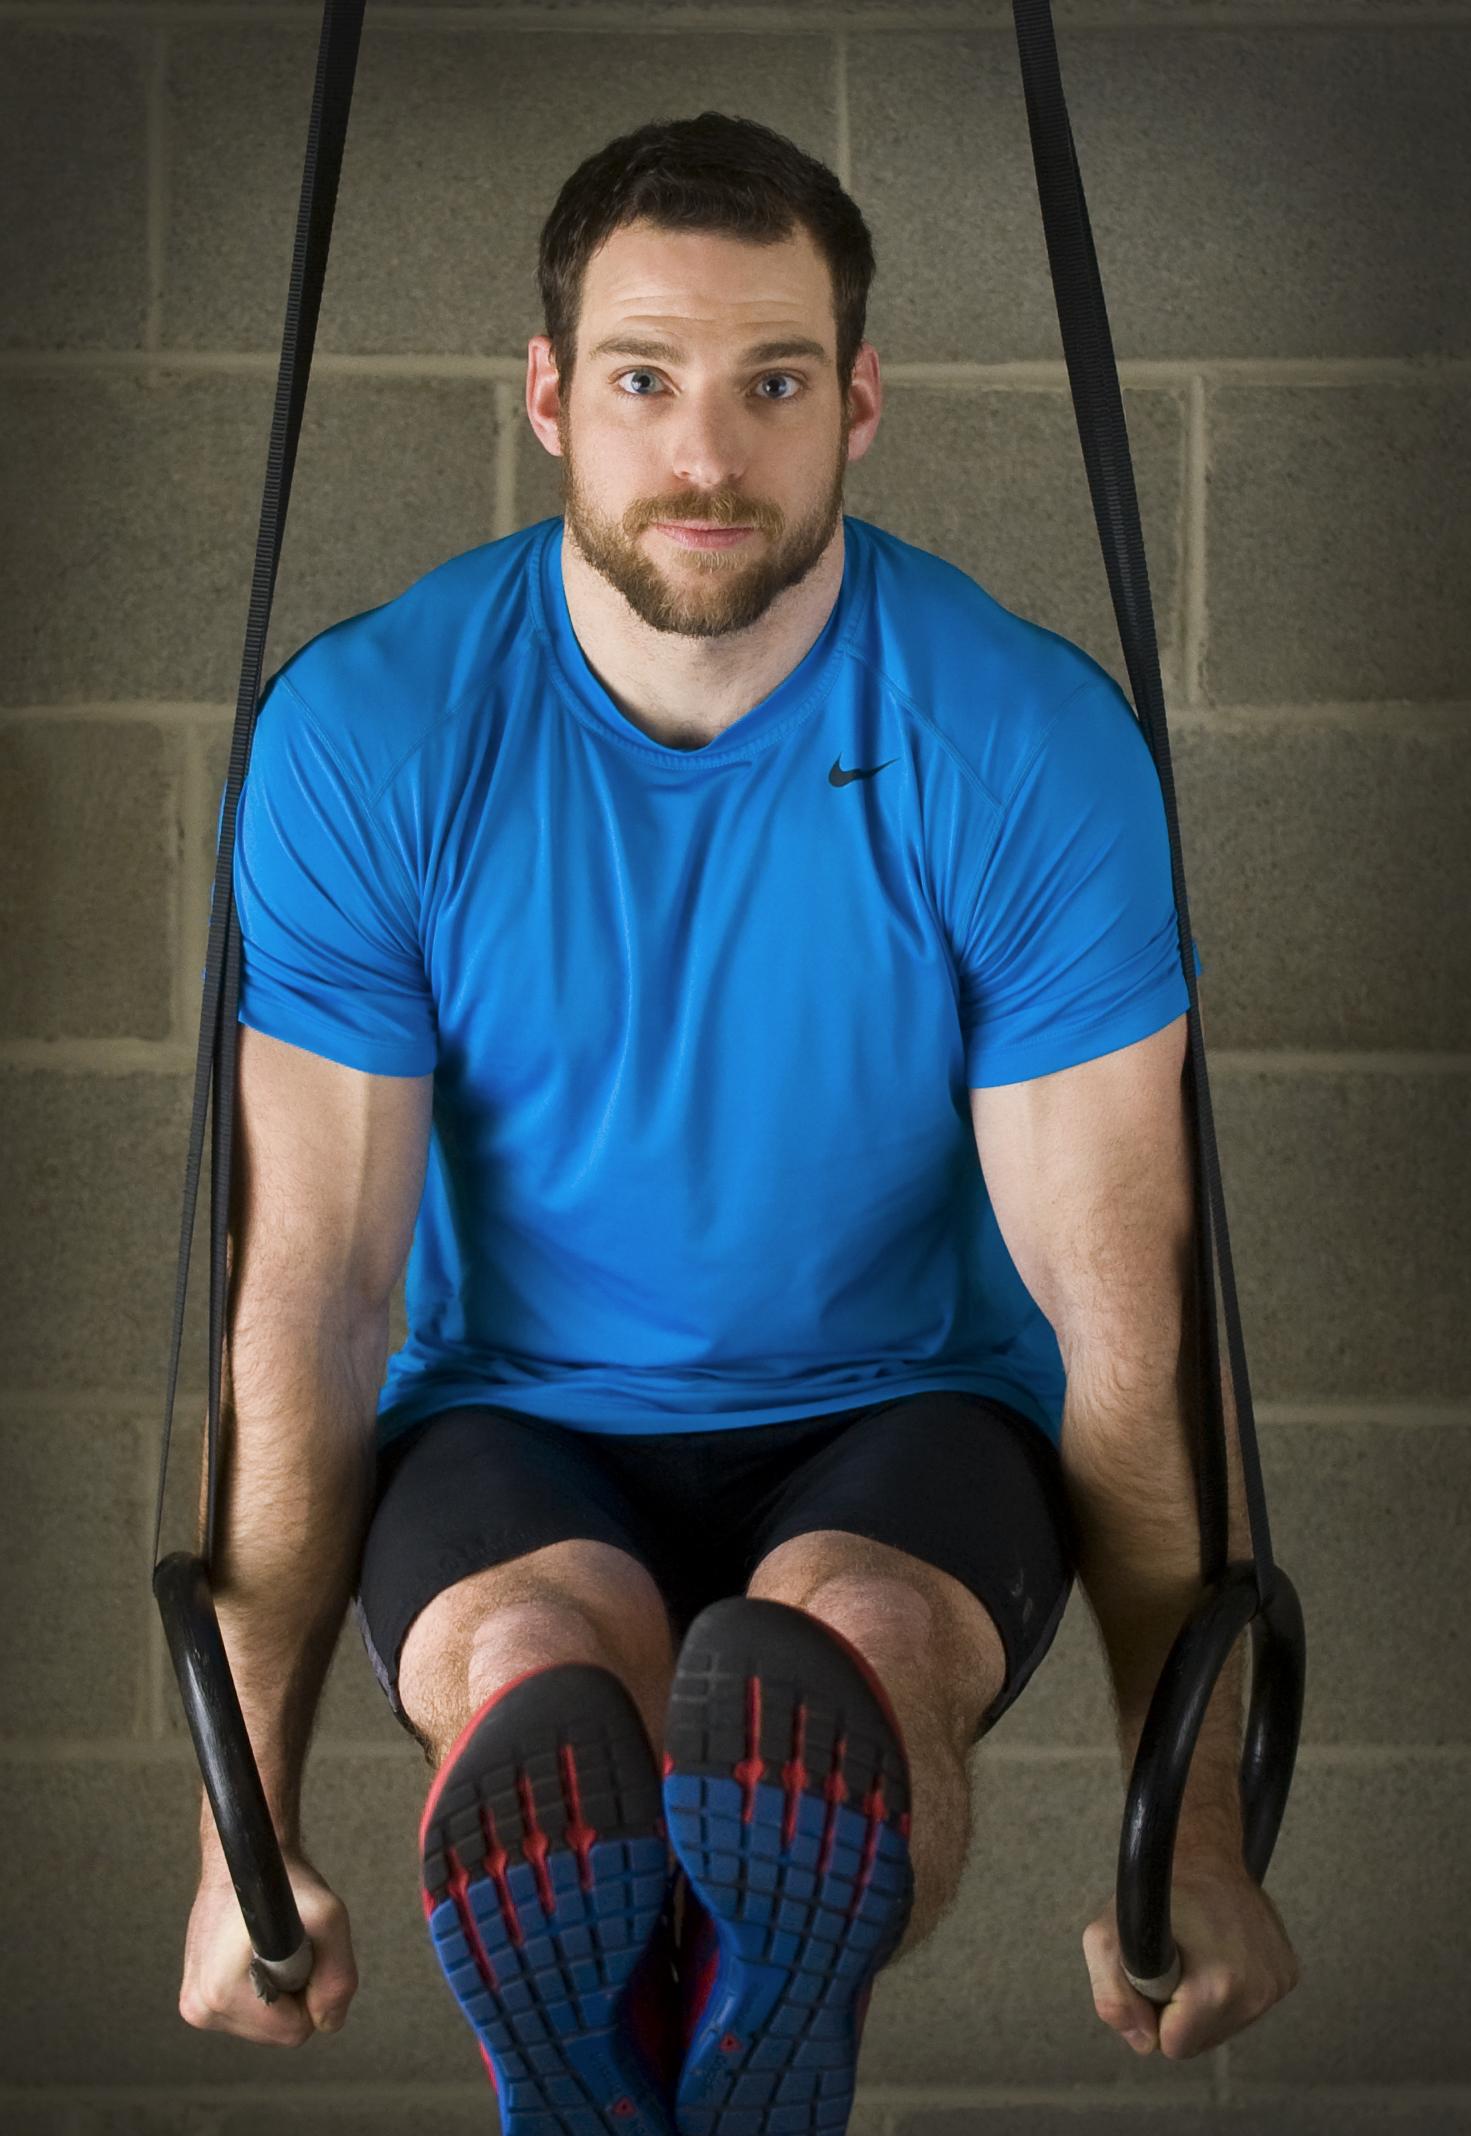 Andrew Radcliffe - Trainer